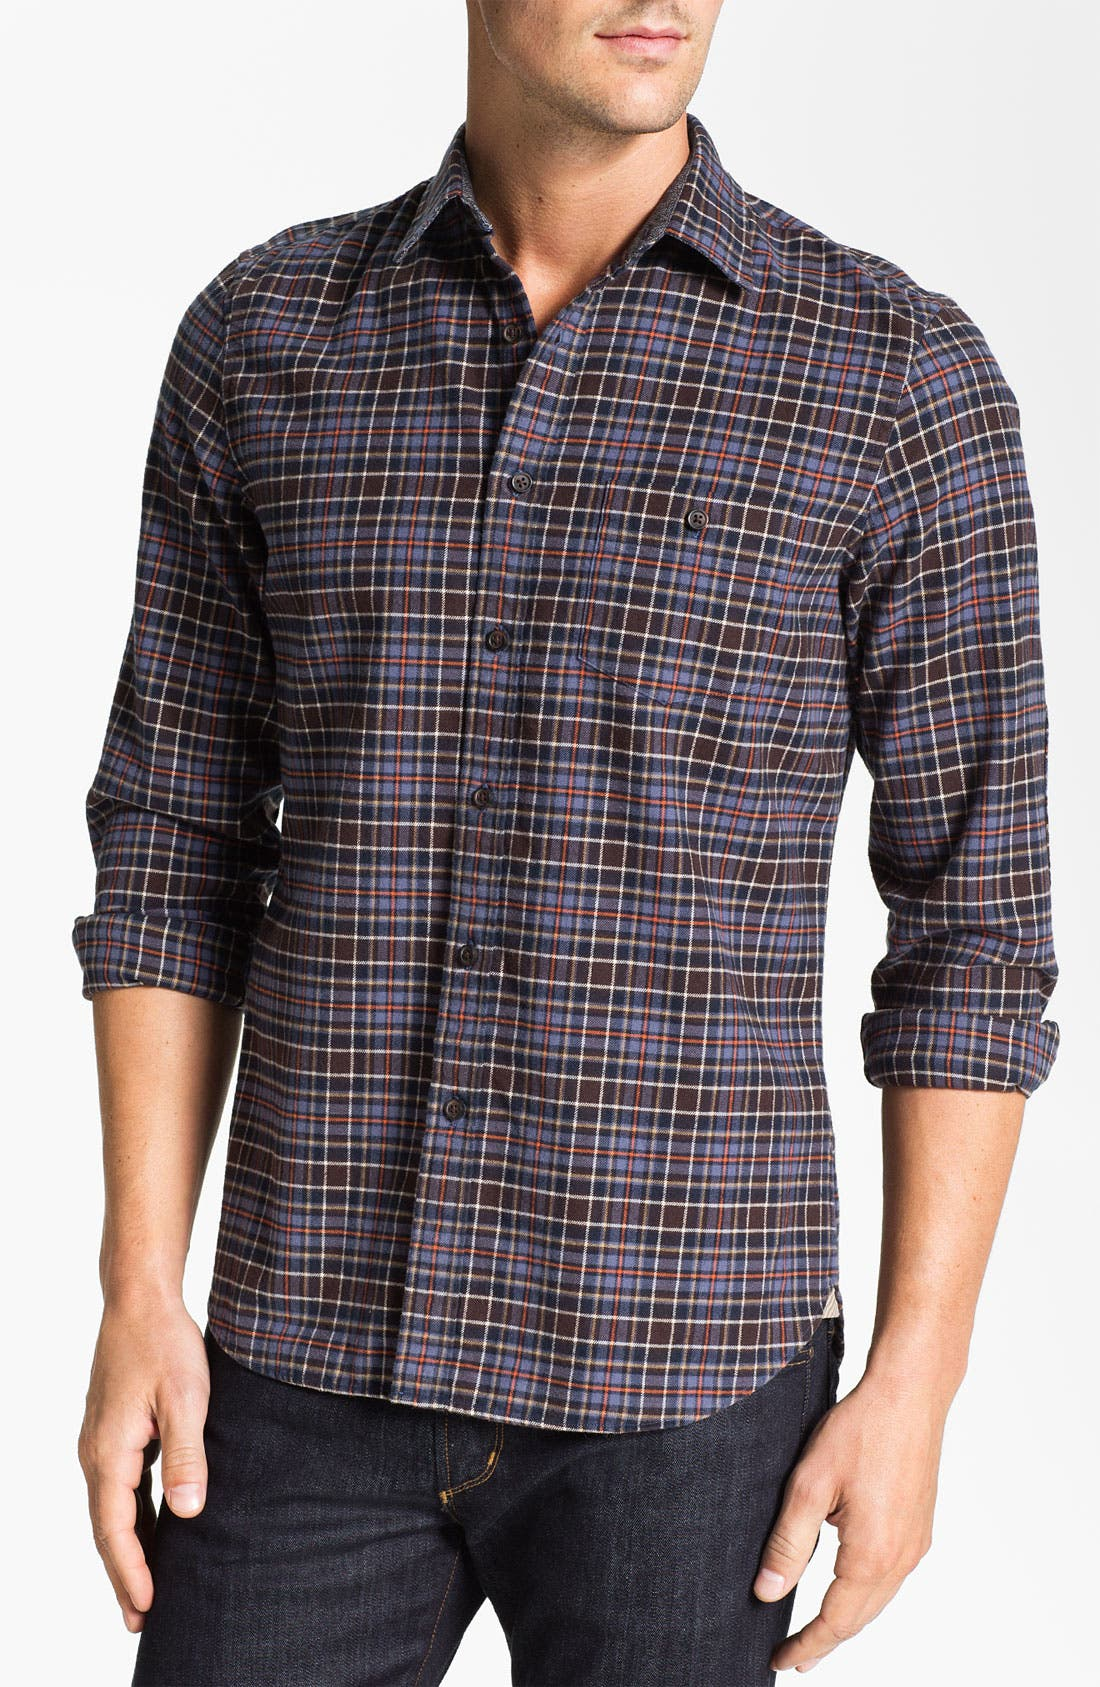 Main Image - Wallin & Bros. Plaid Flannel Shirt